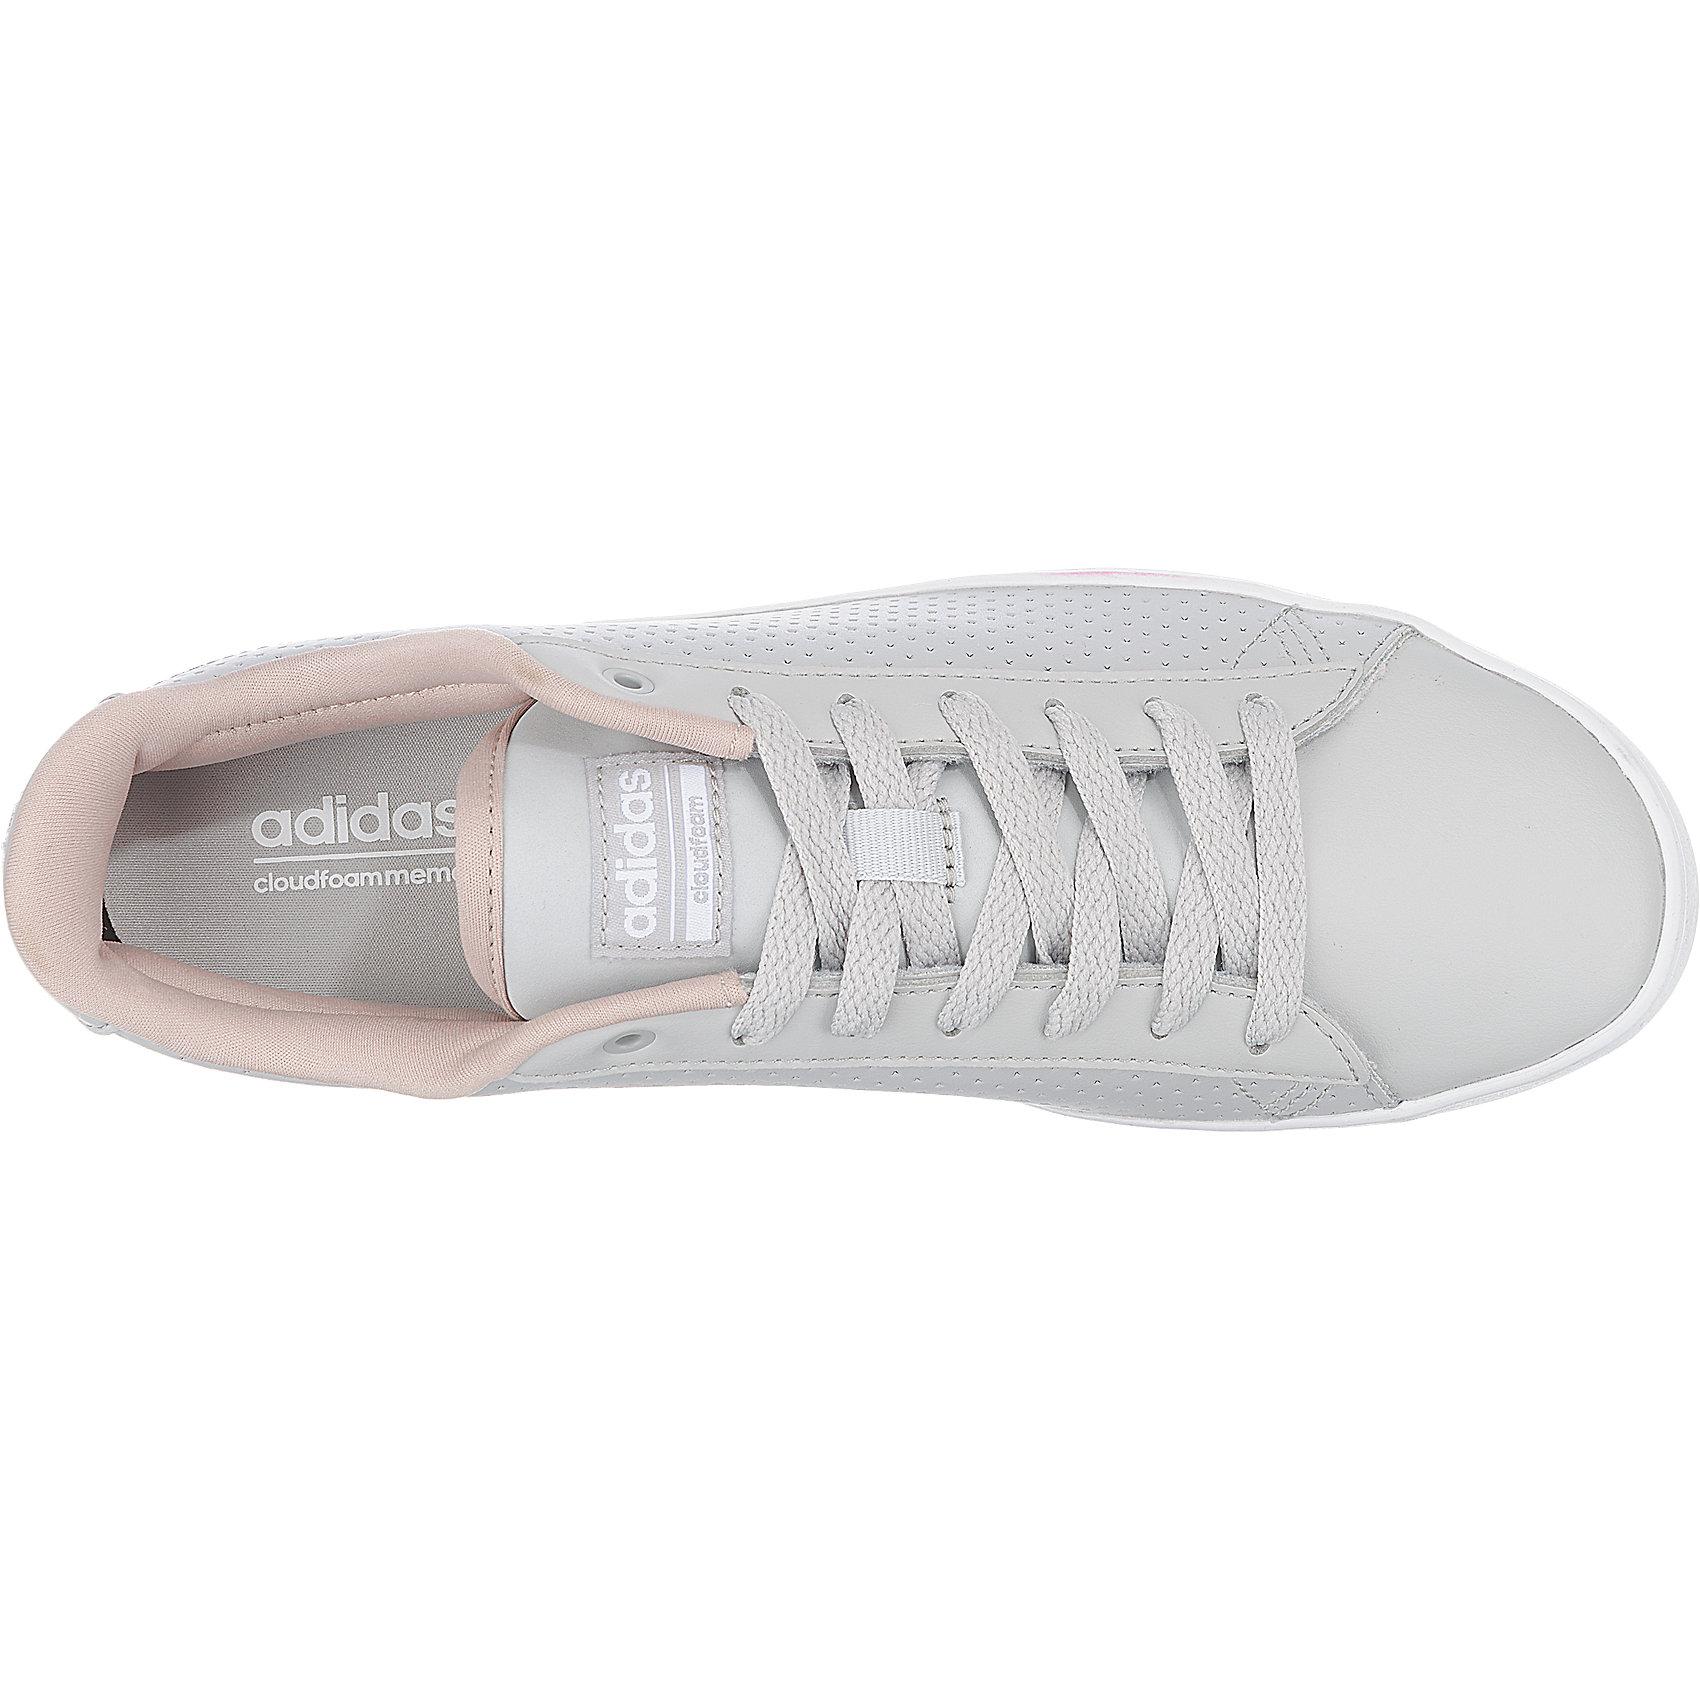 Neu adidas NEO NEO NEO Cf Daily Qt Cl Sneakers weiß grau 5778504 aa1ae9